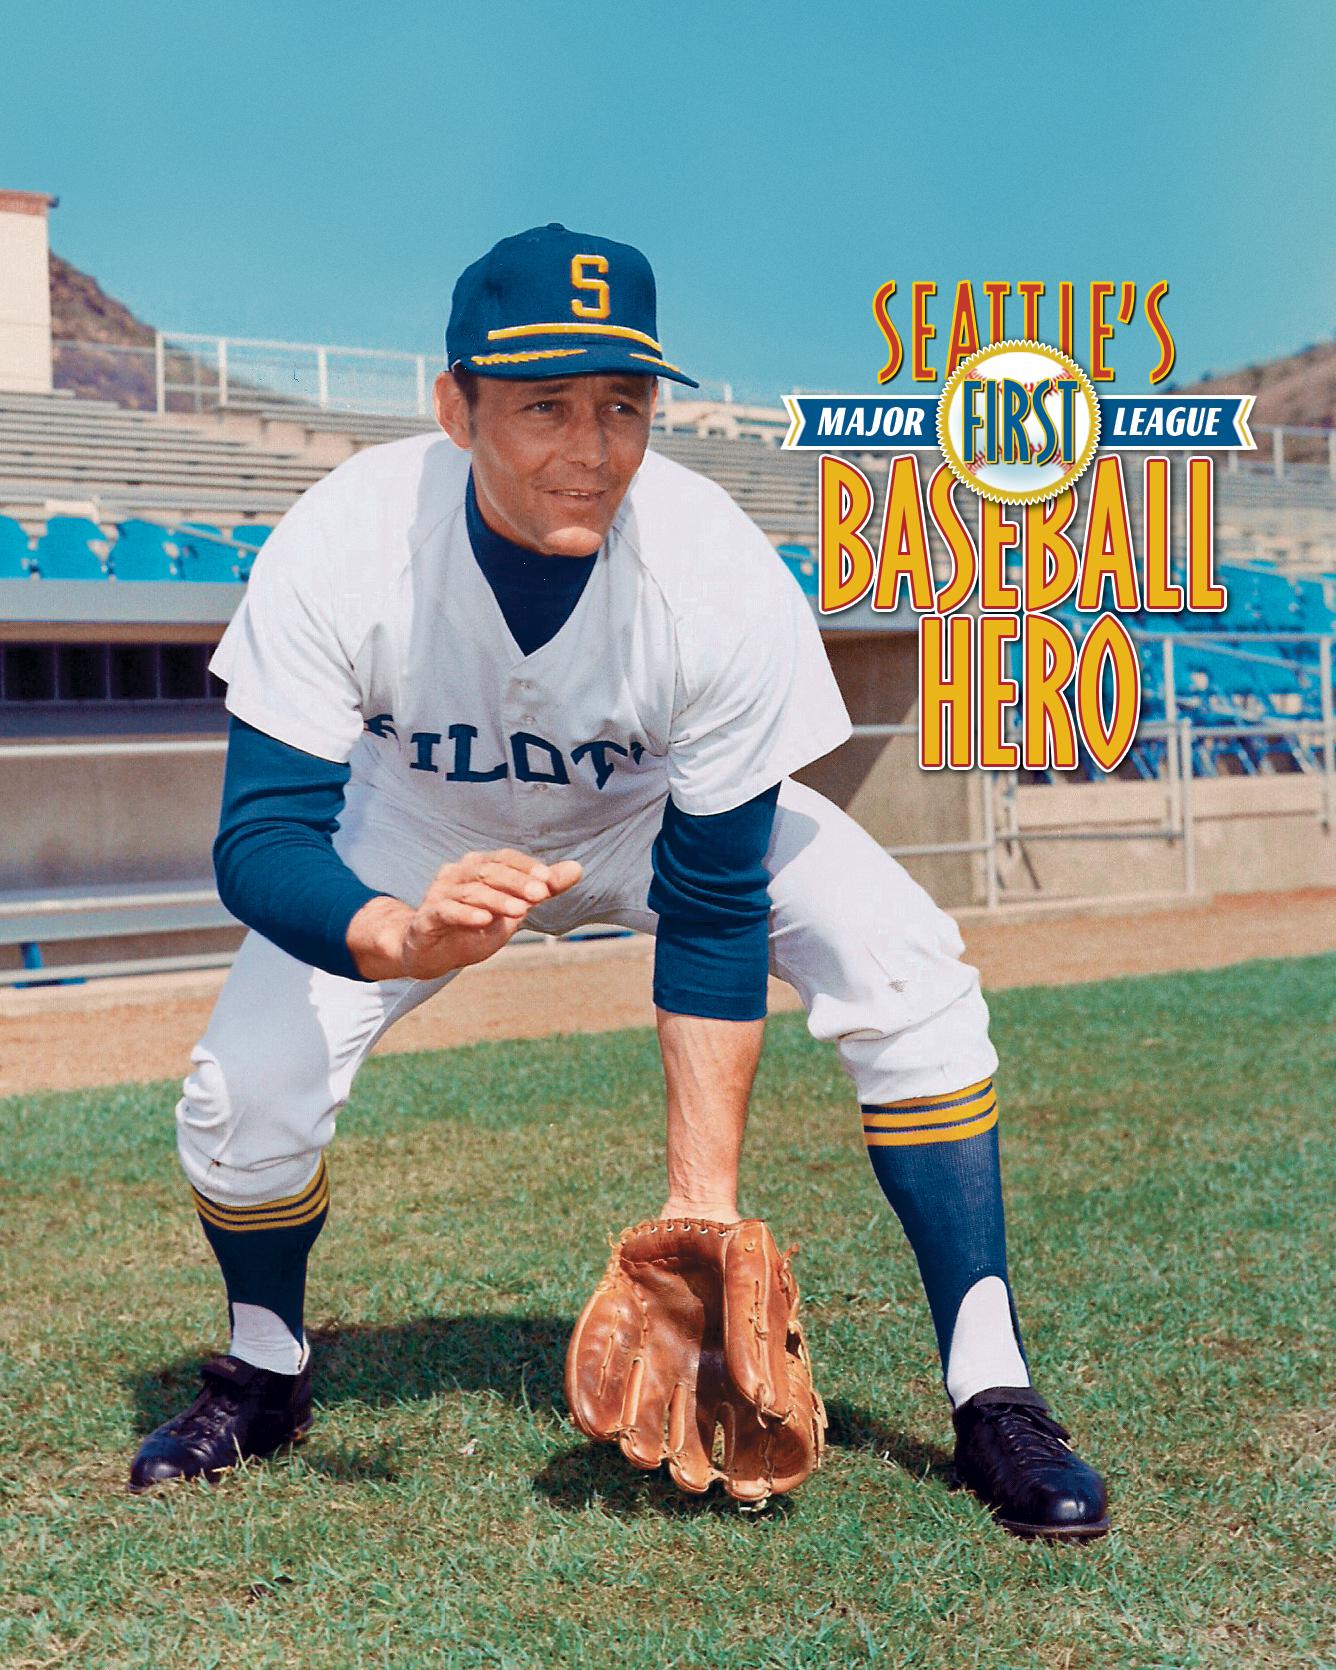 Pin By Mark Lowell Norman On Abc Higher Quality Baseball Photos And Cards Baseball Major League Baseball Teams Baseball Equipment